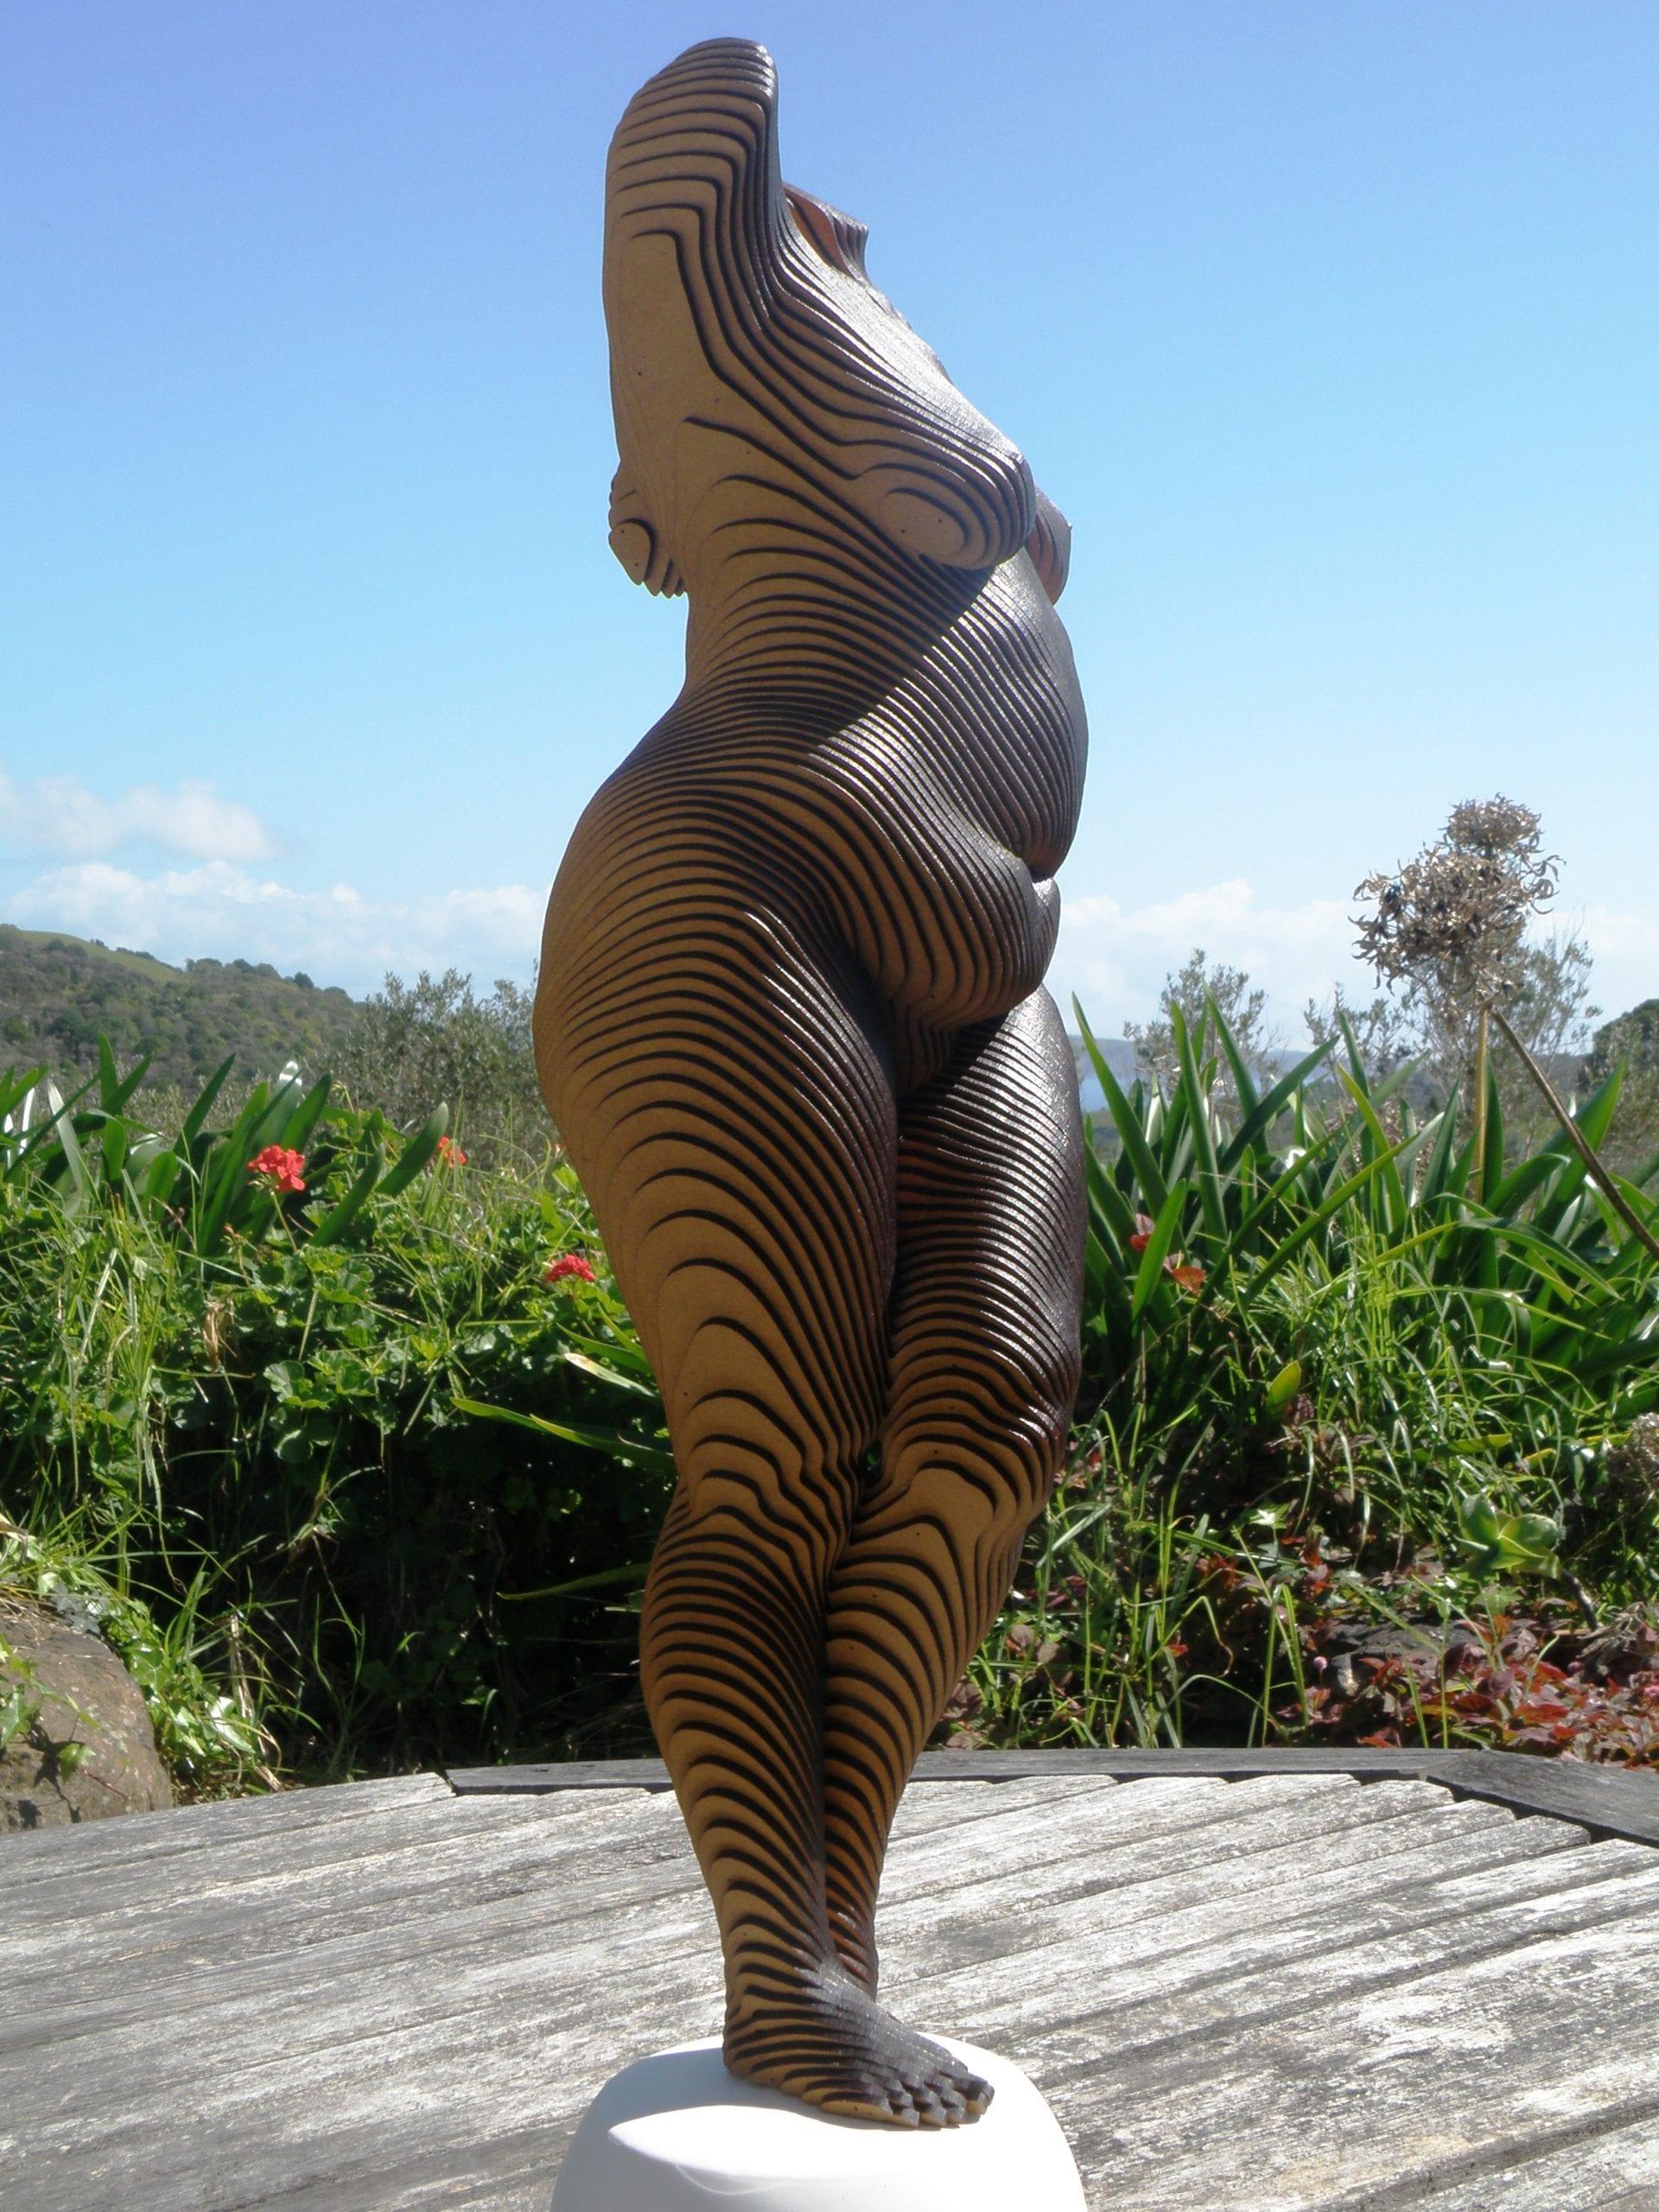 Olivia Wilde Frontal Nude And Bikini Photos - PlayCelebs.net